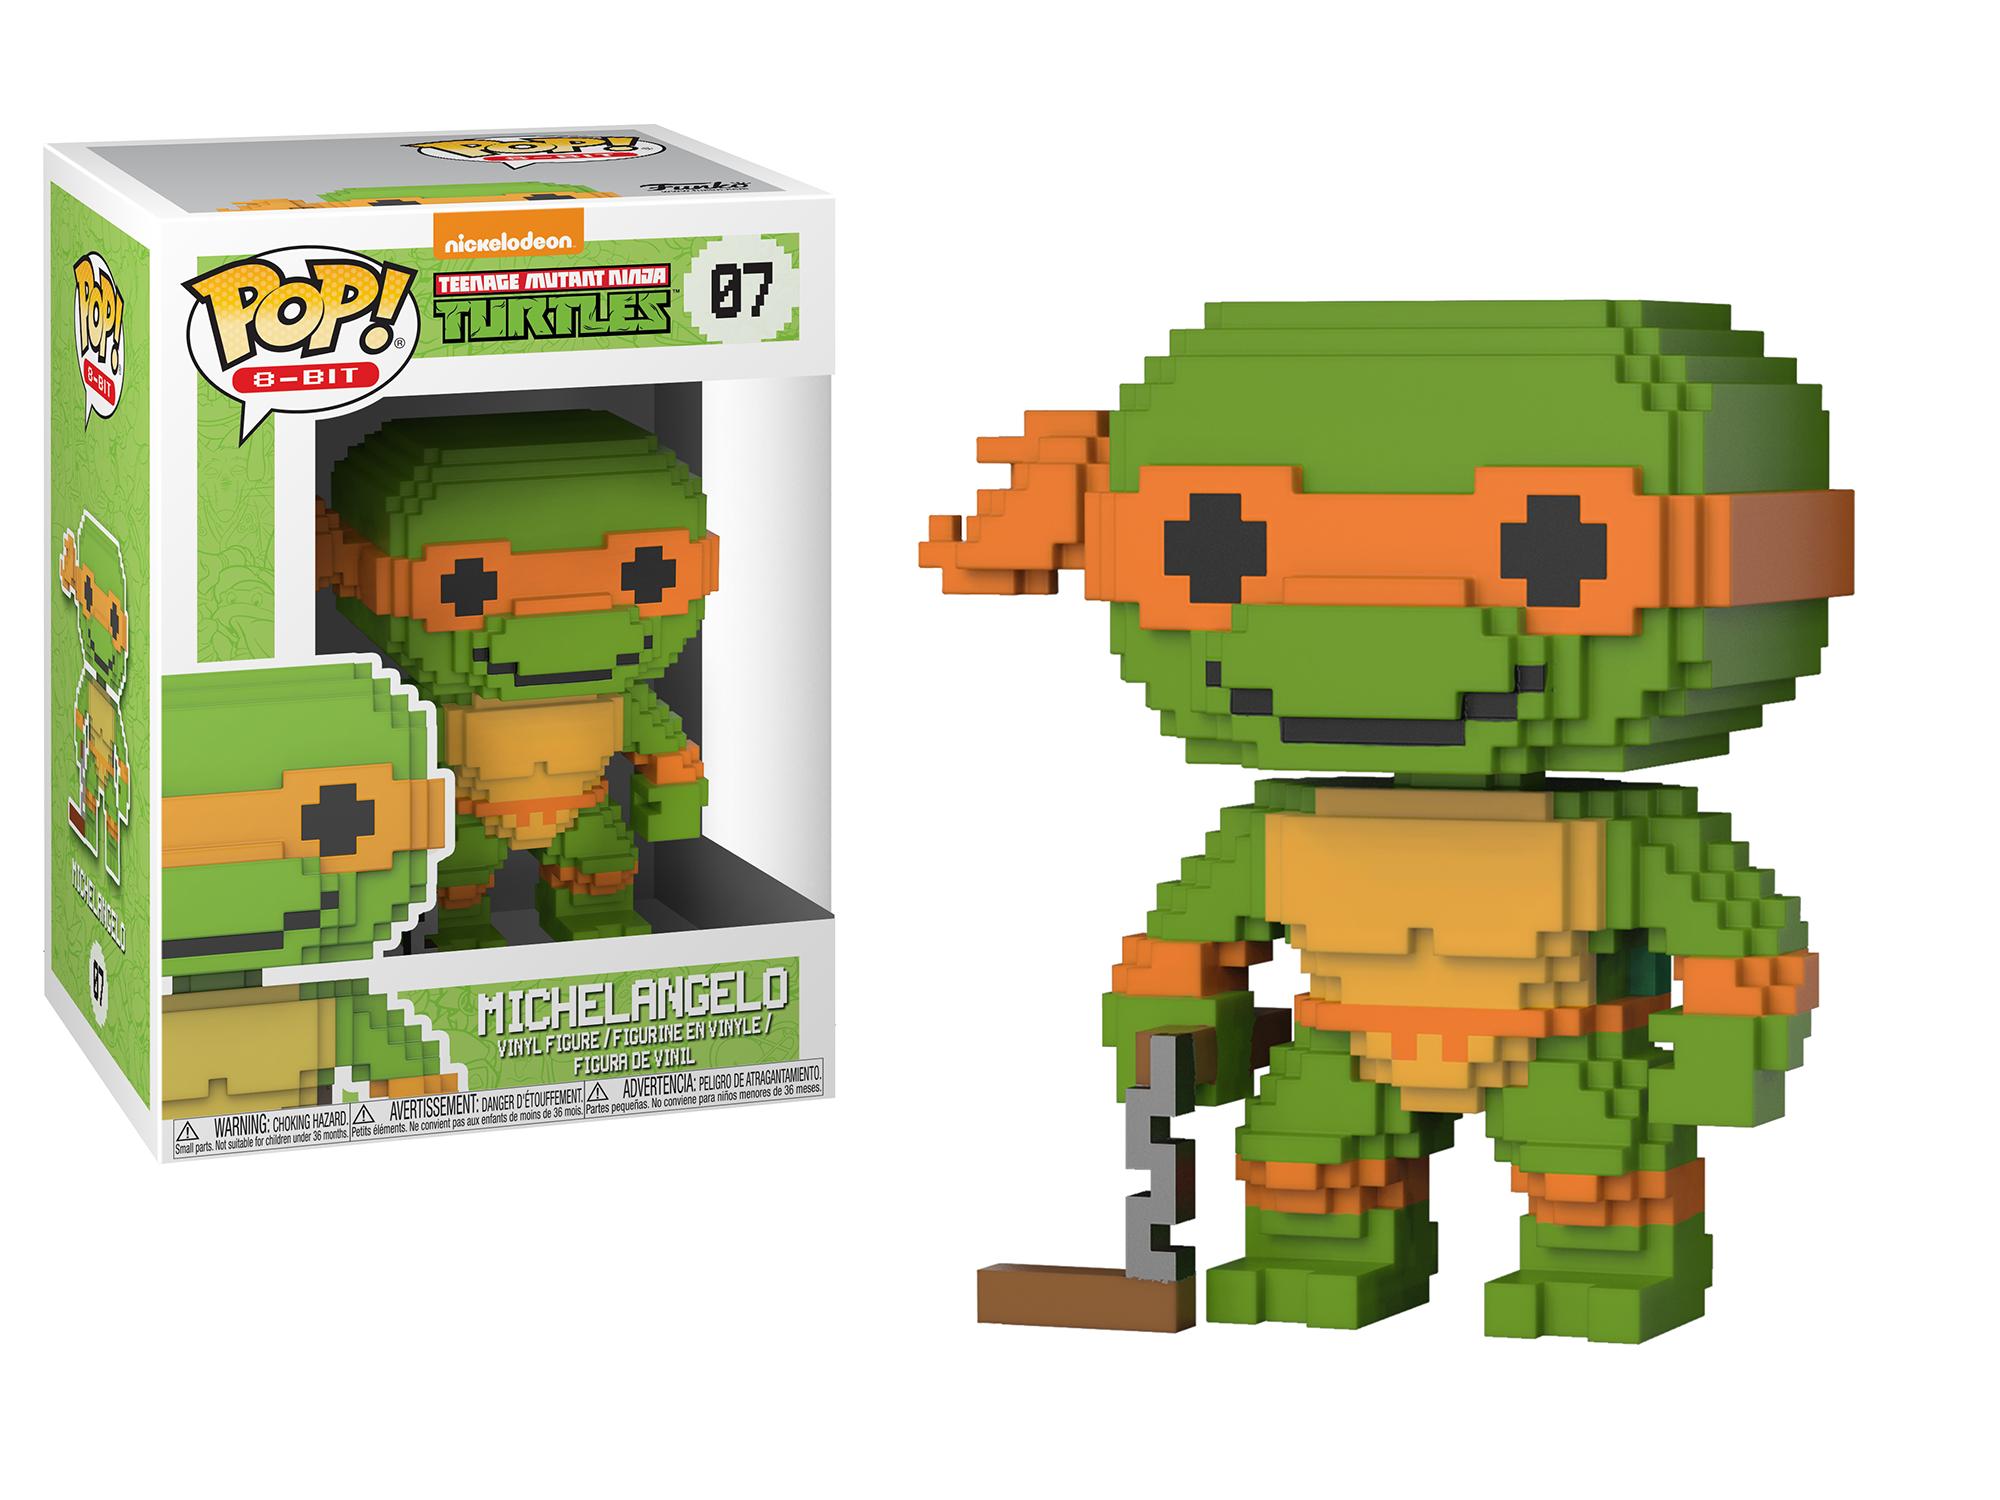 Funko Pop 8-Bit: Teenage Mutant Ninja Turtles - Michelangelo